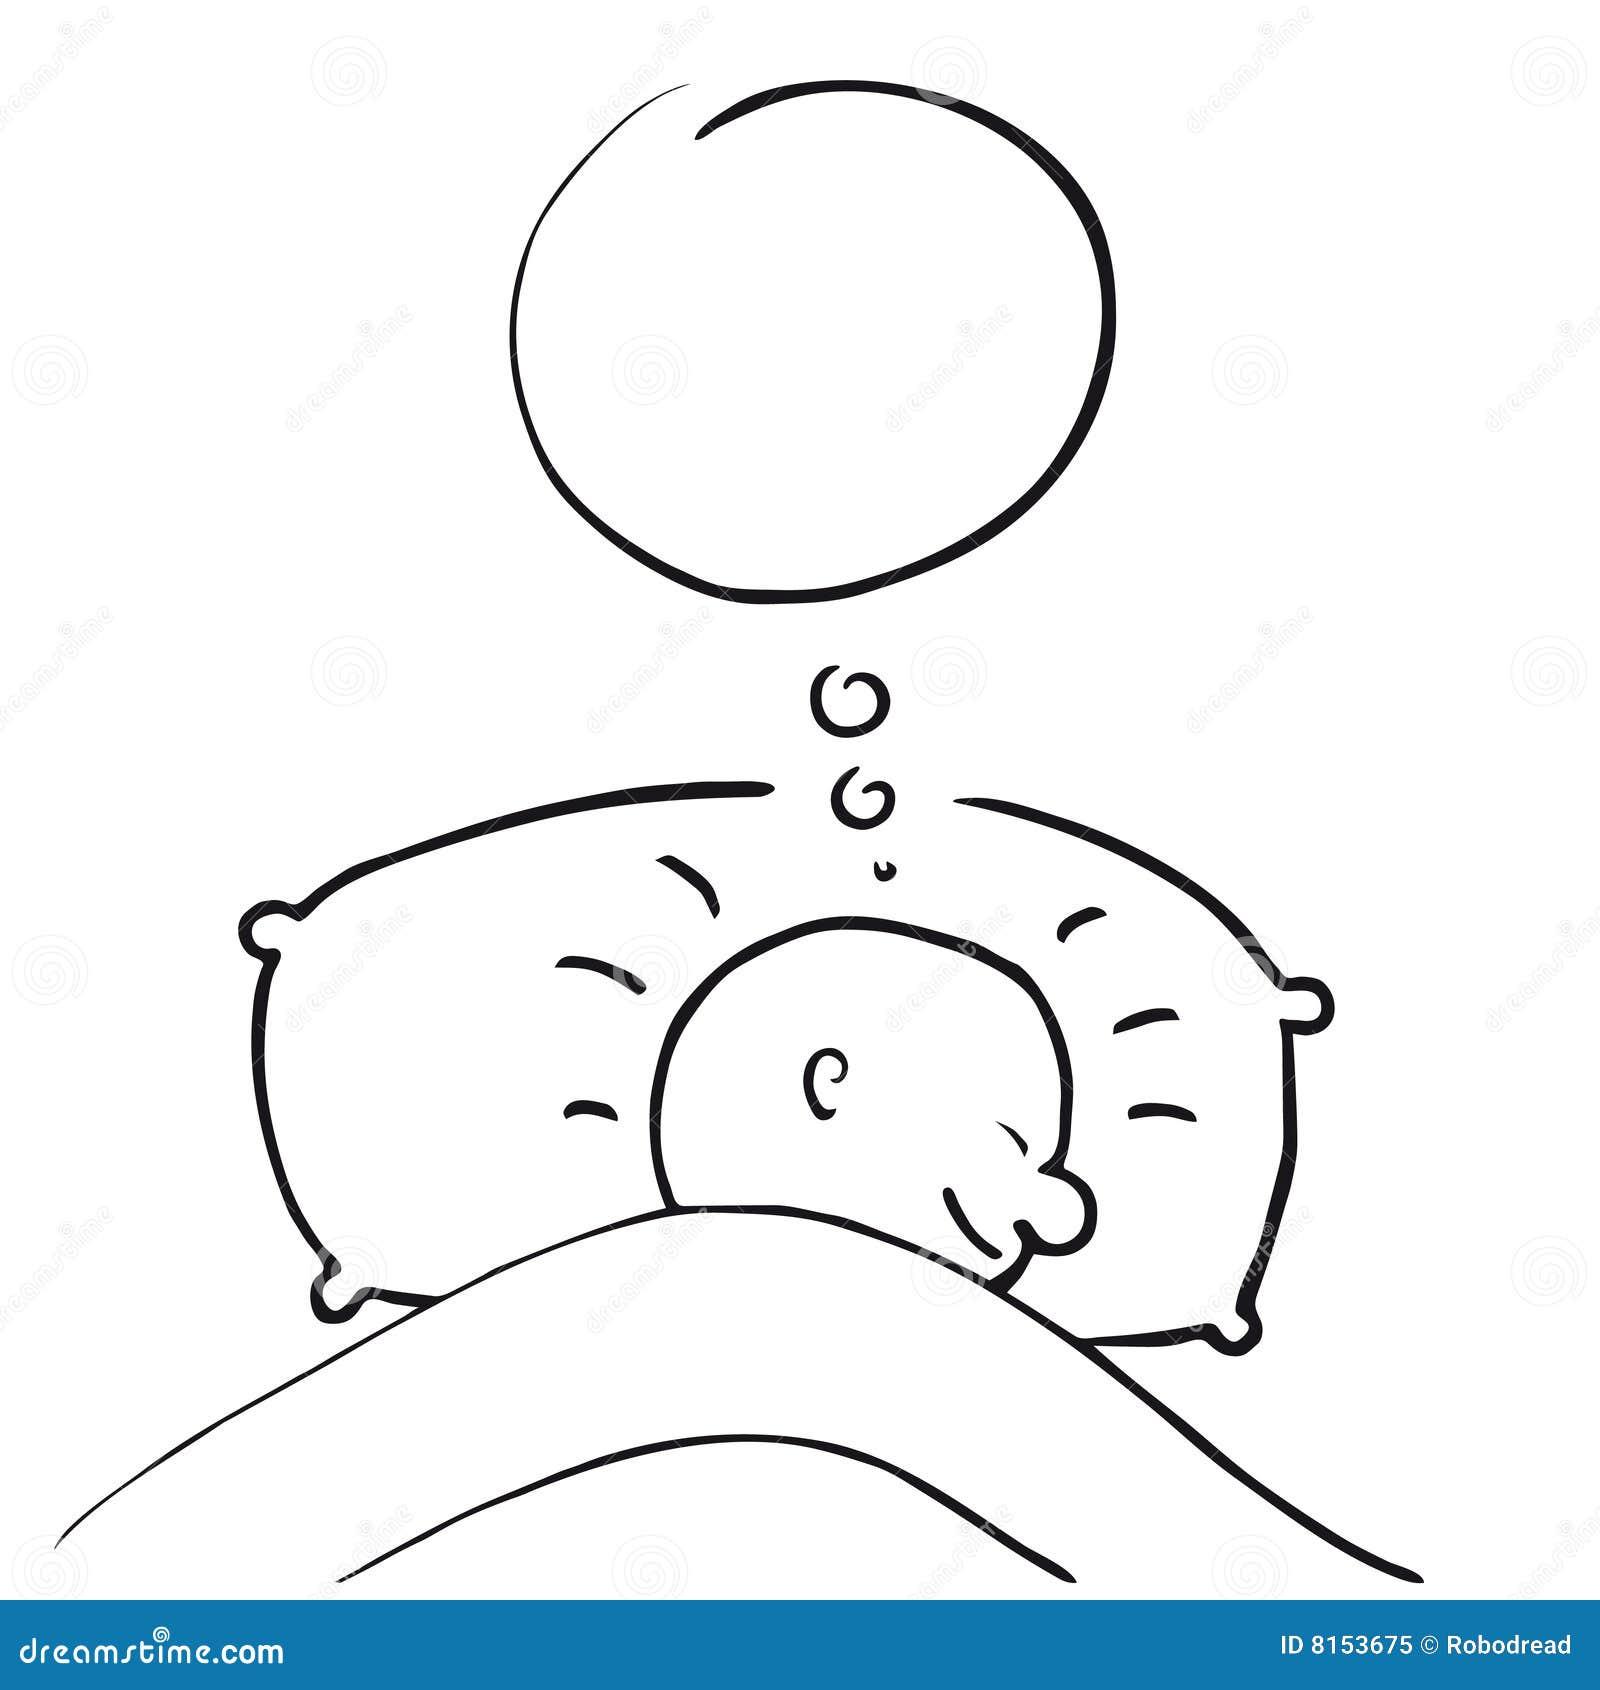 Dream Vector Stock Vector Illustration Of Time Rest